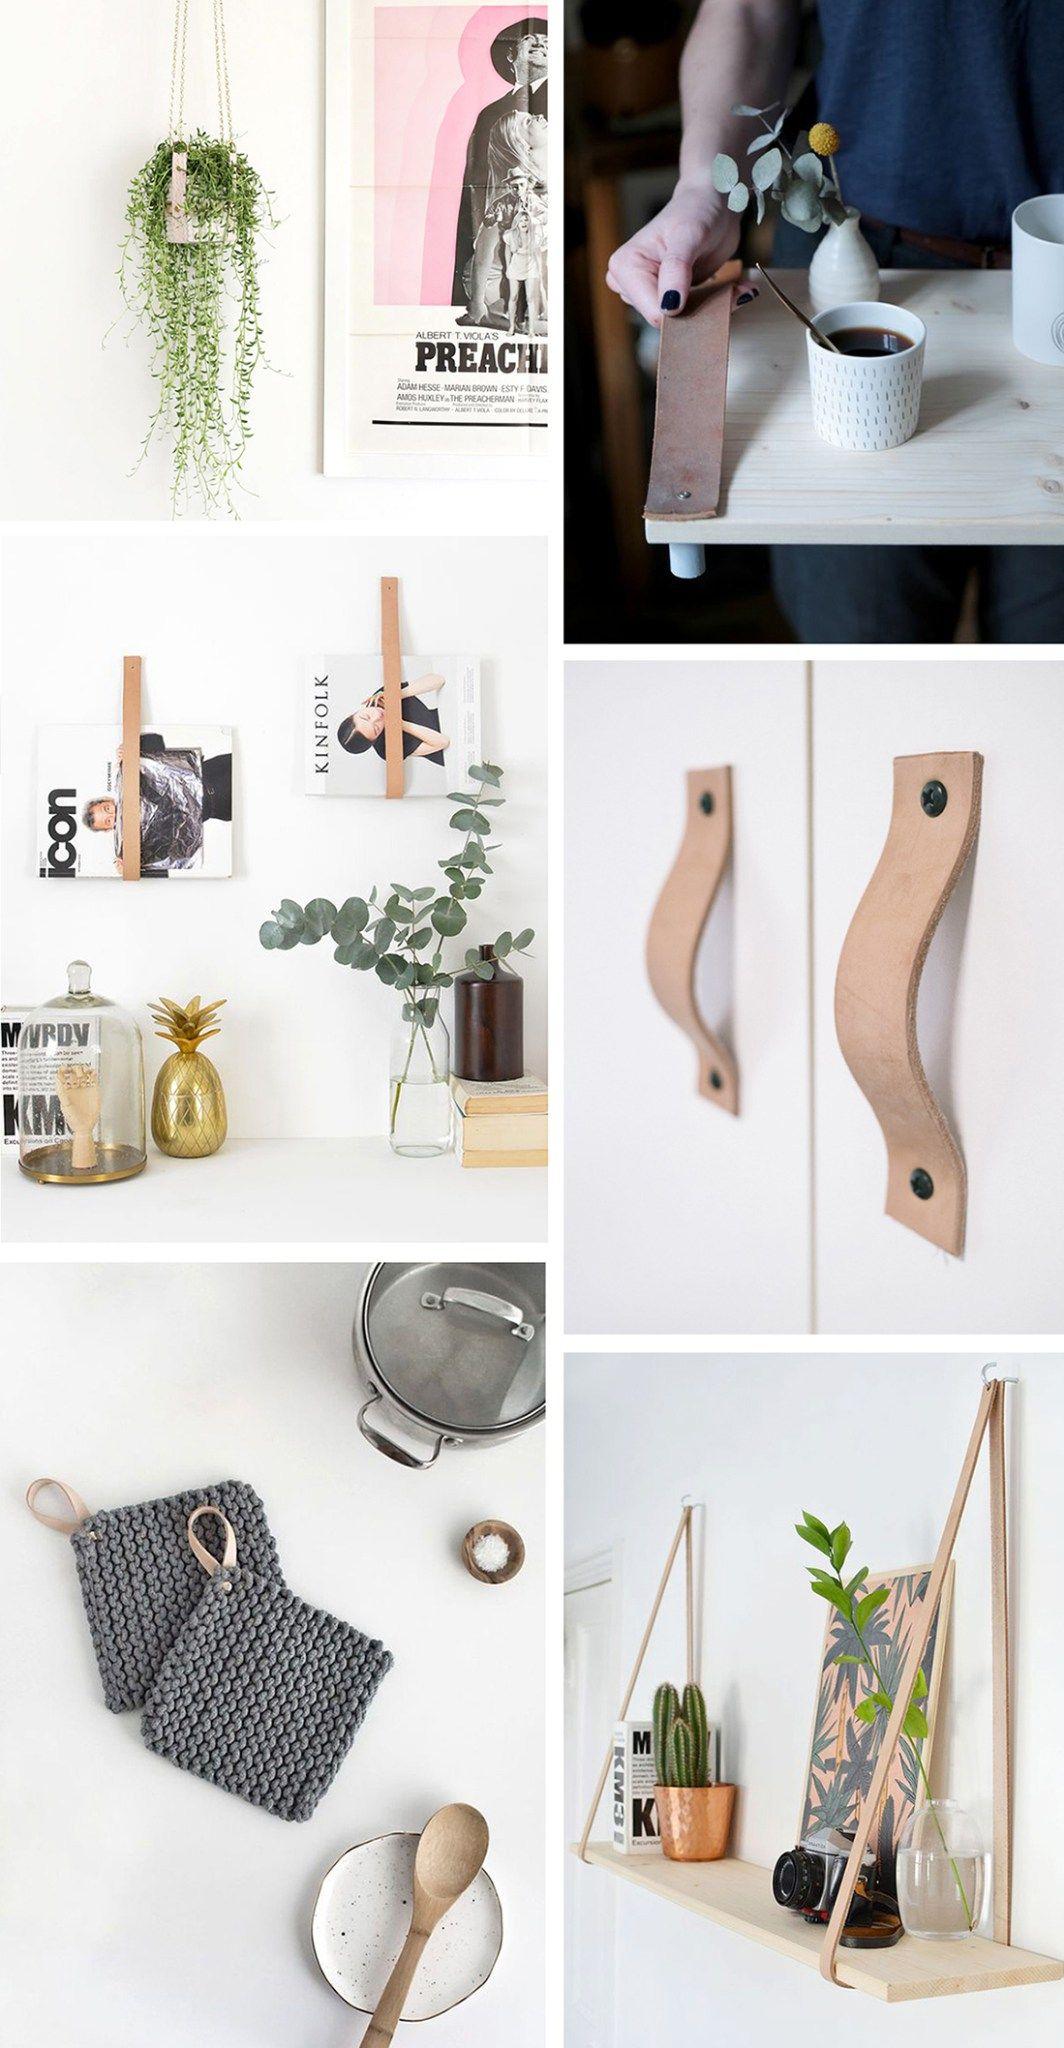 Best Scandinavian interior design ideas | Feelings, Interiors and ...